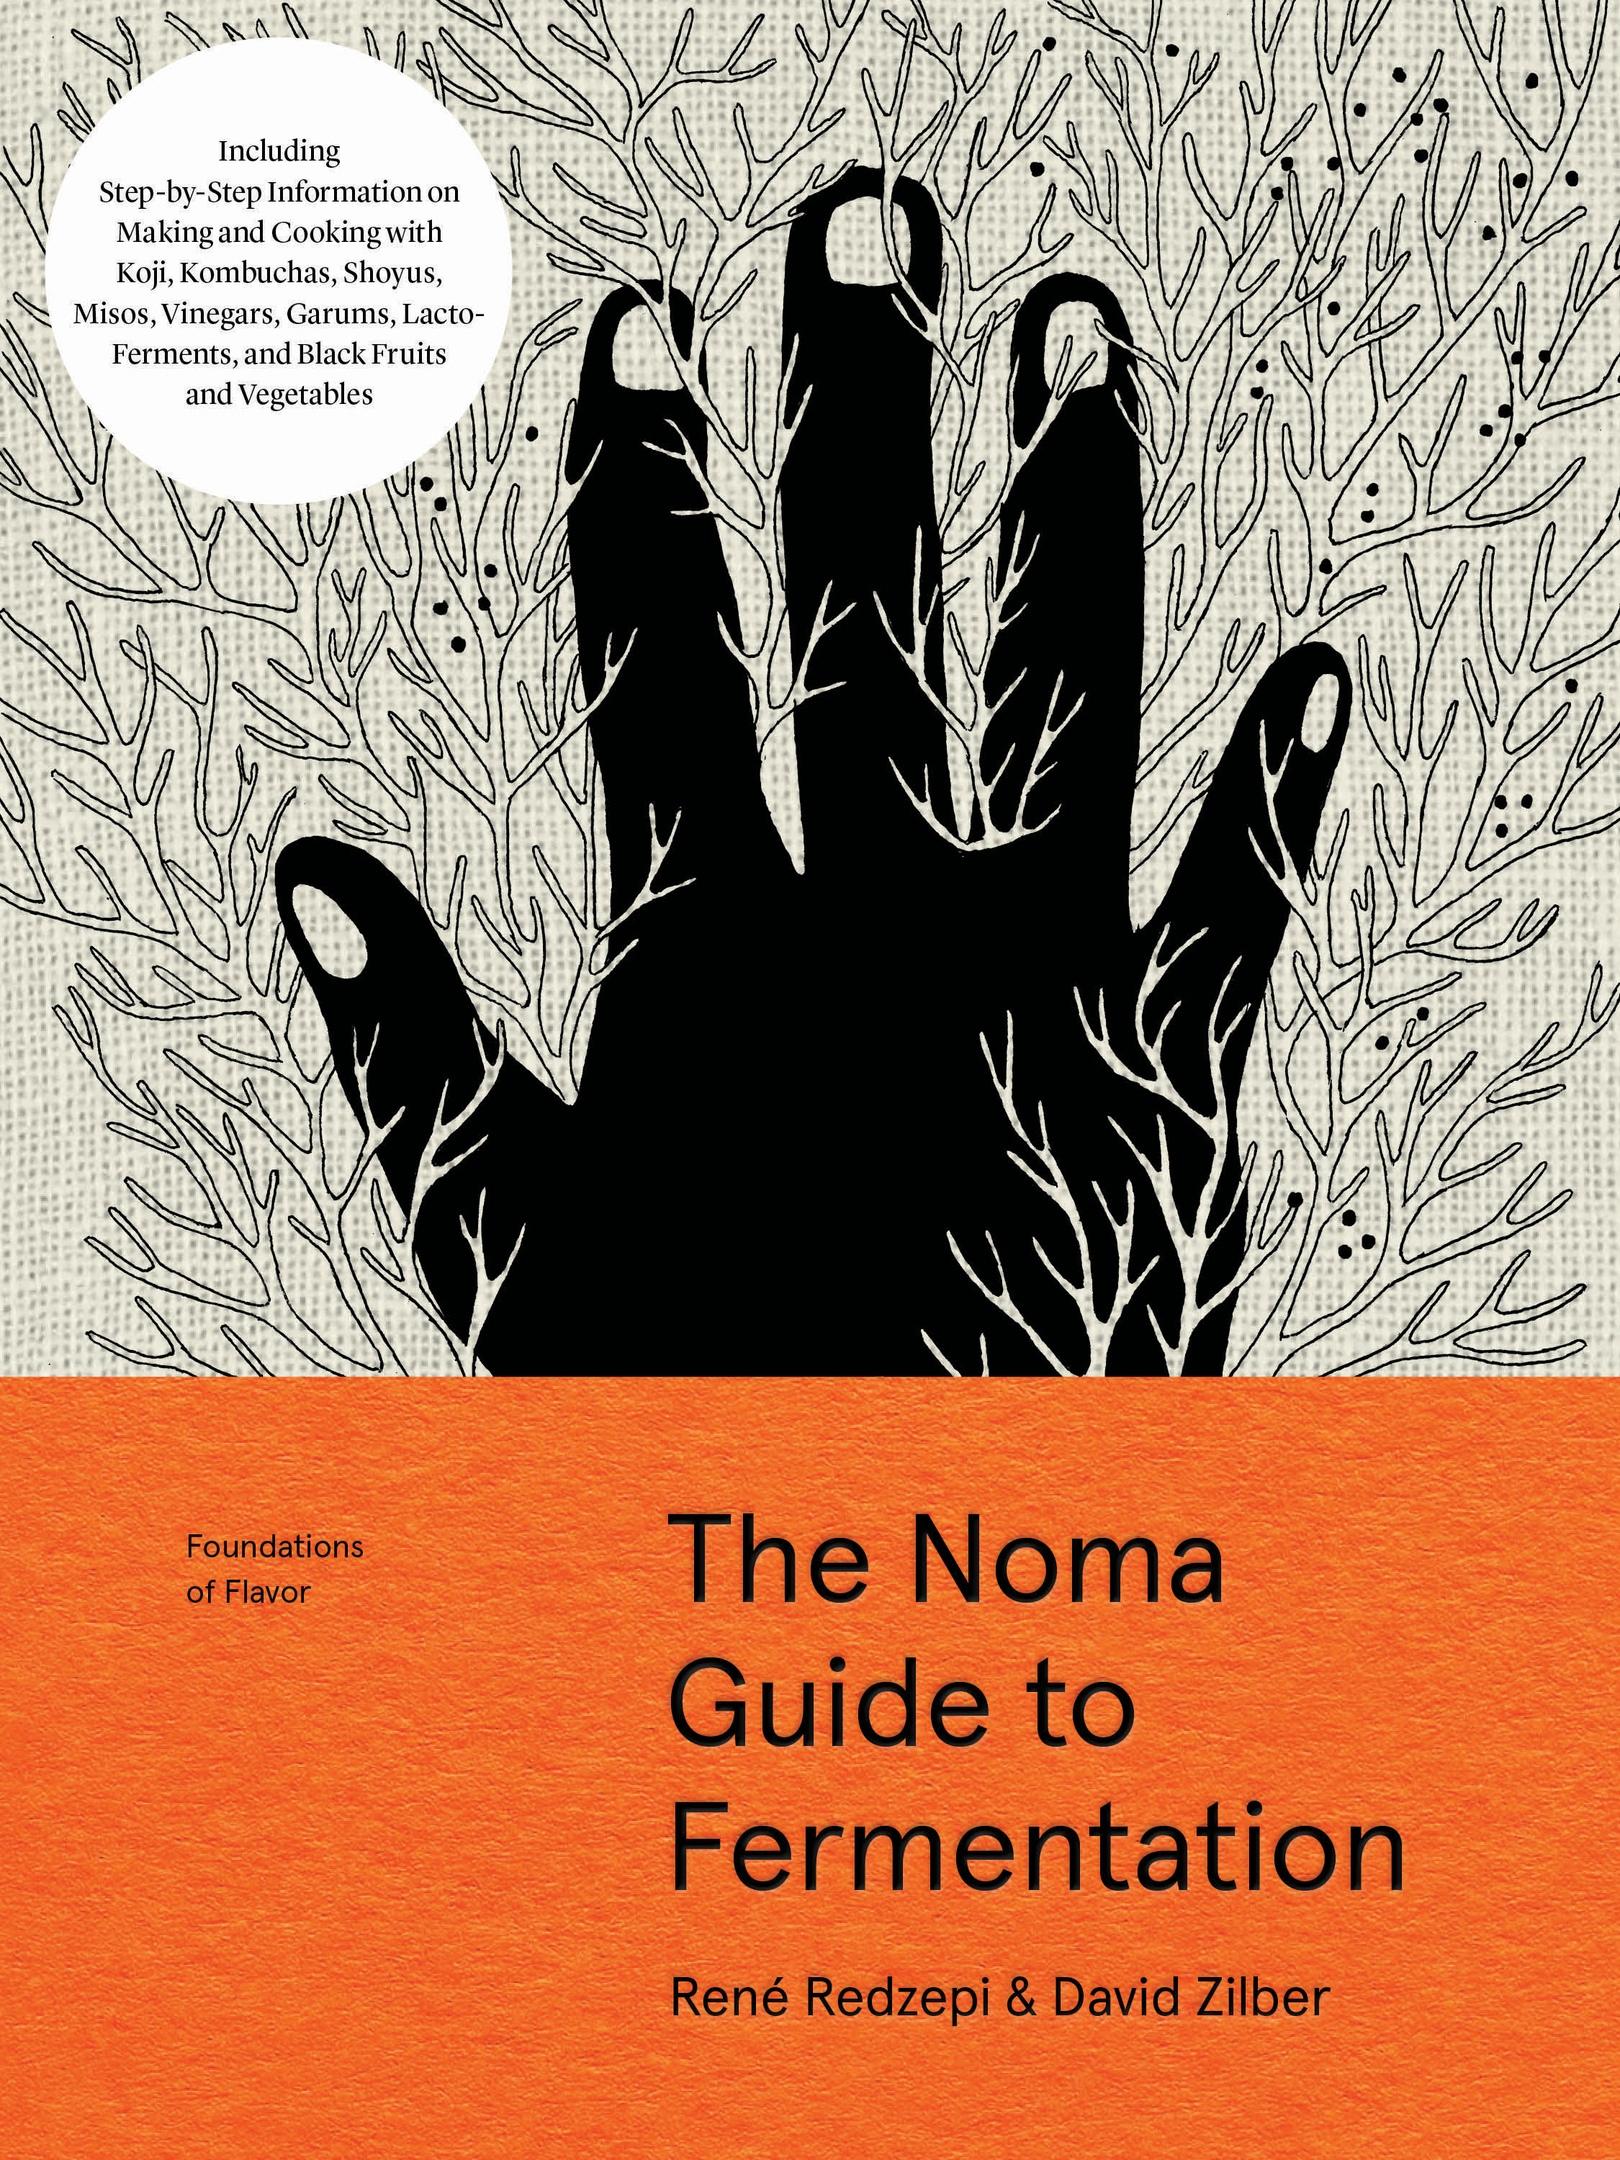 Rene Redzepi – The Noma Guide To Fermentation